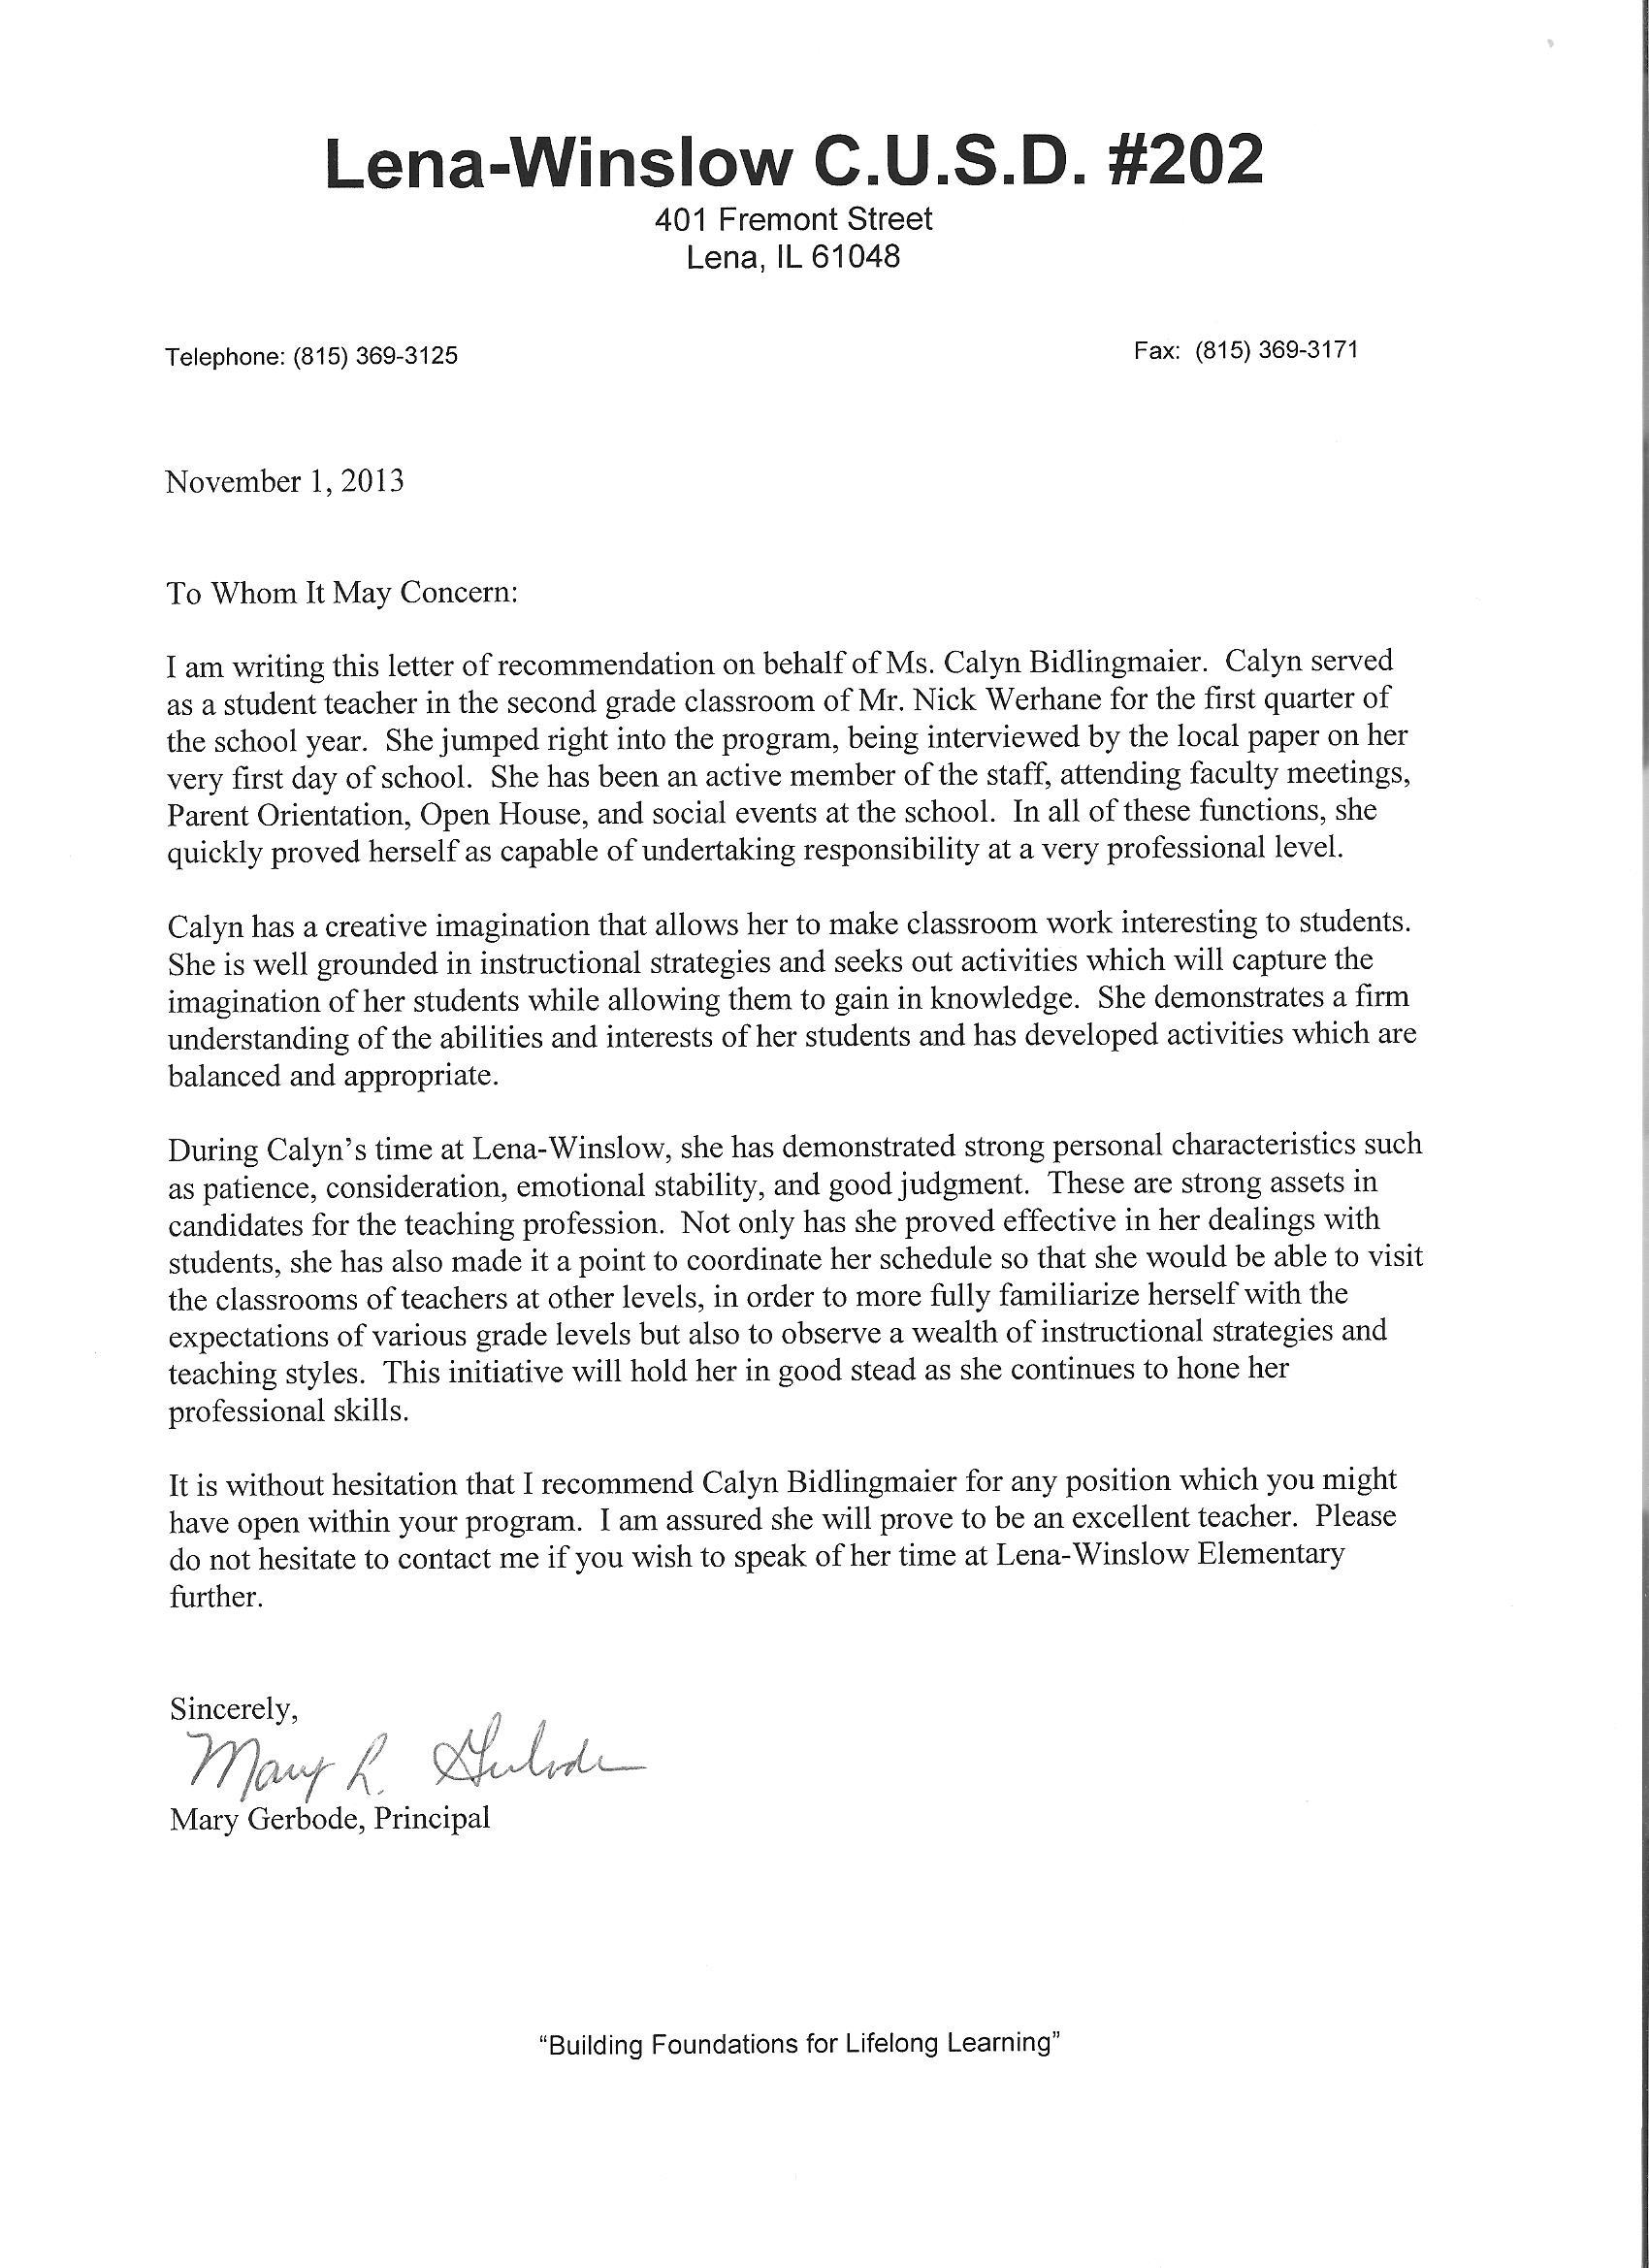 Medford Elementary School Patchogue Medford School District Licensure Elements Calyn Bidlingmaiers Teaching Portfolio